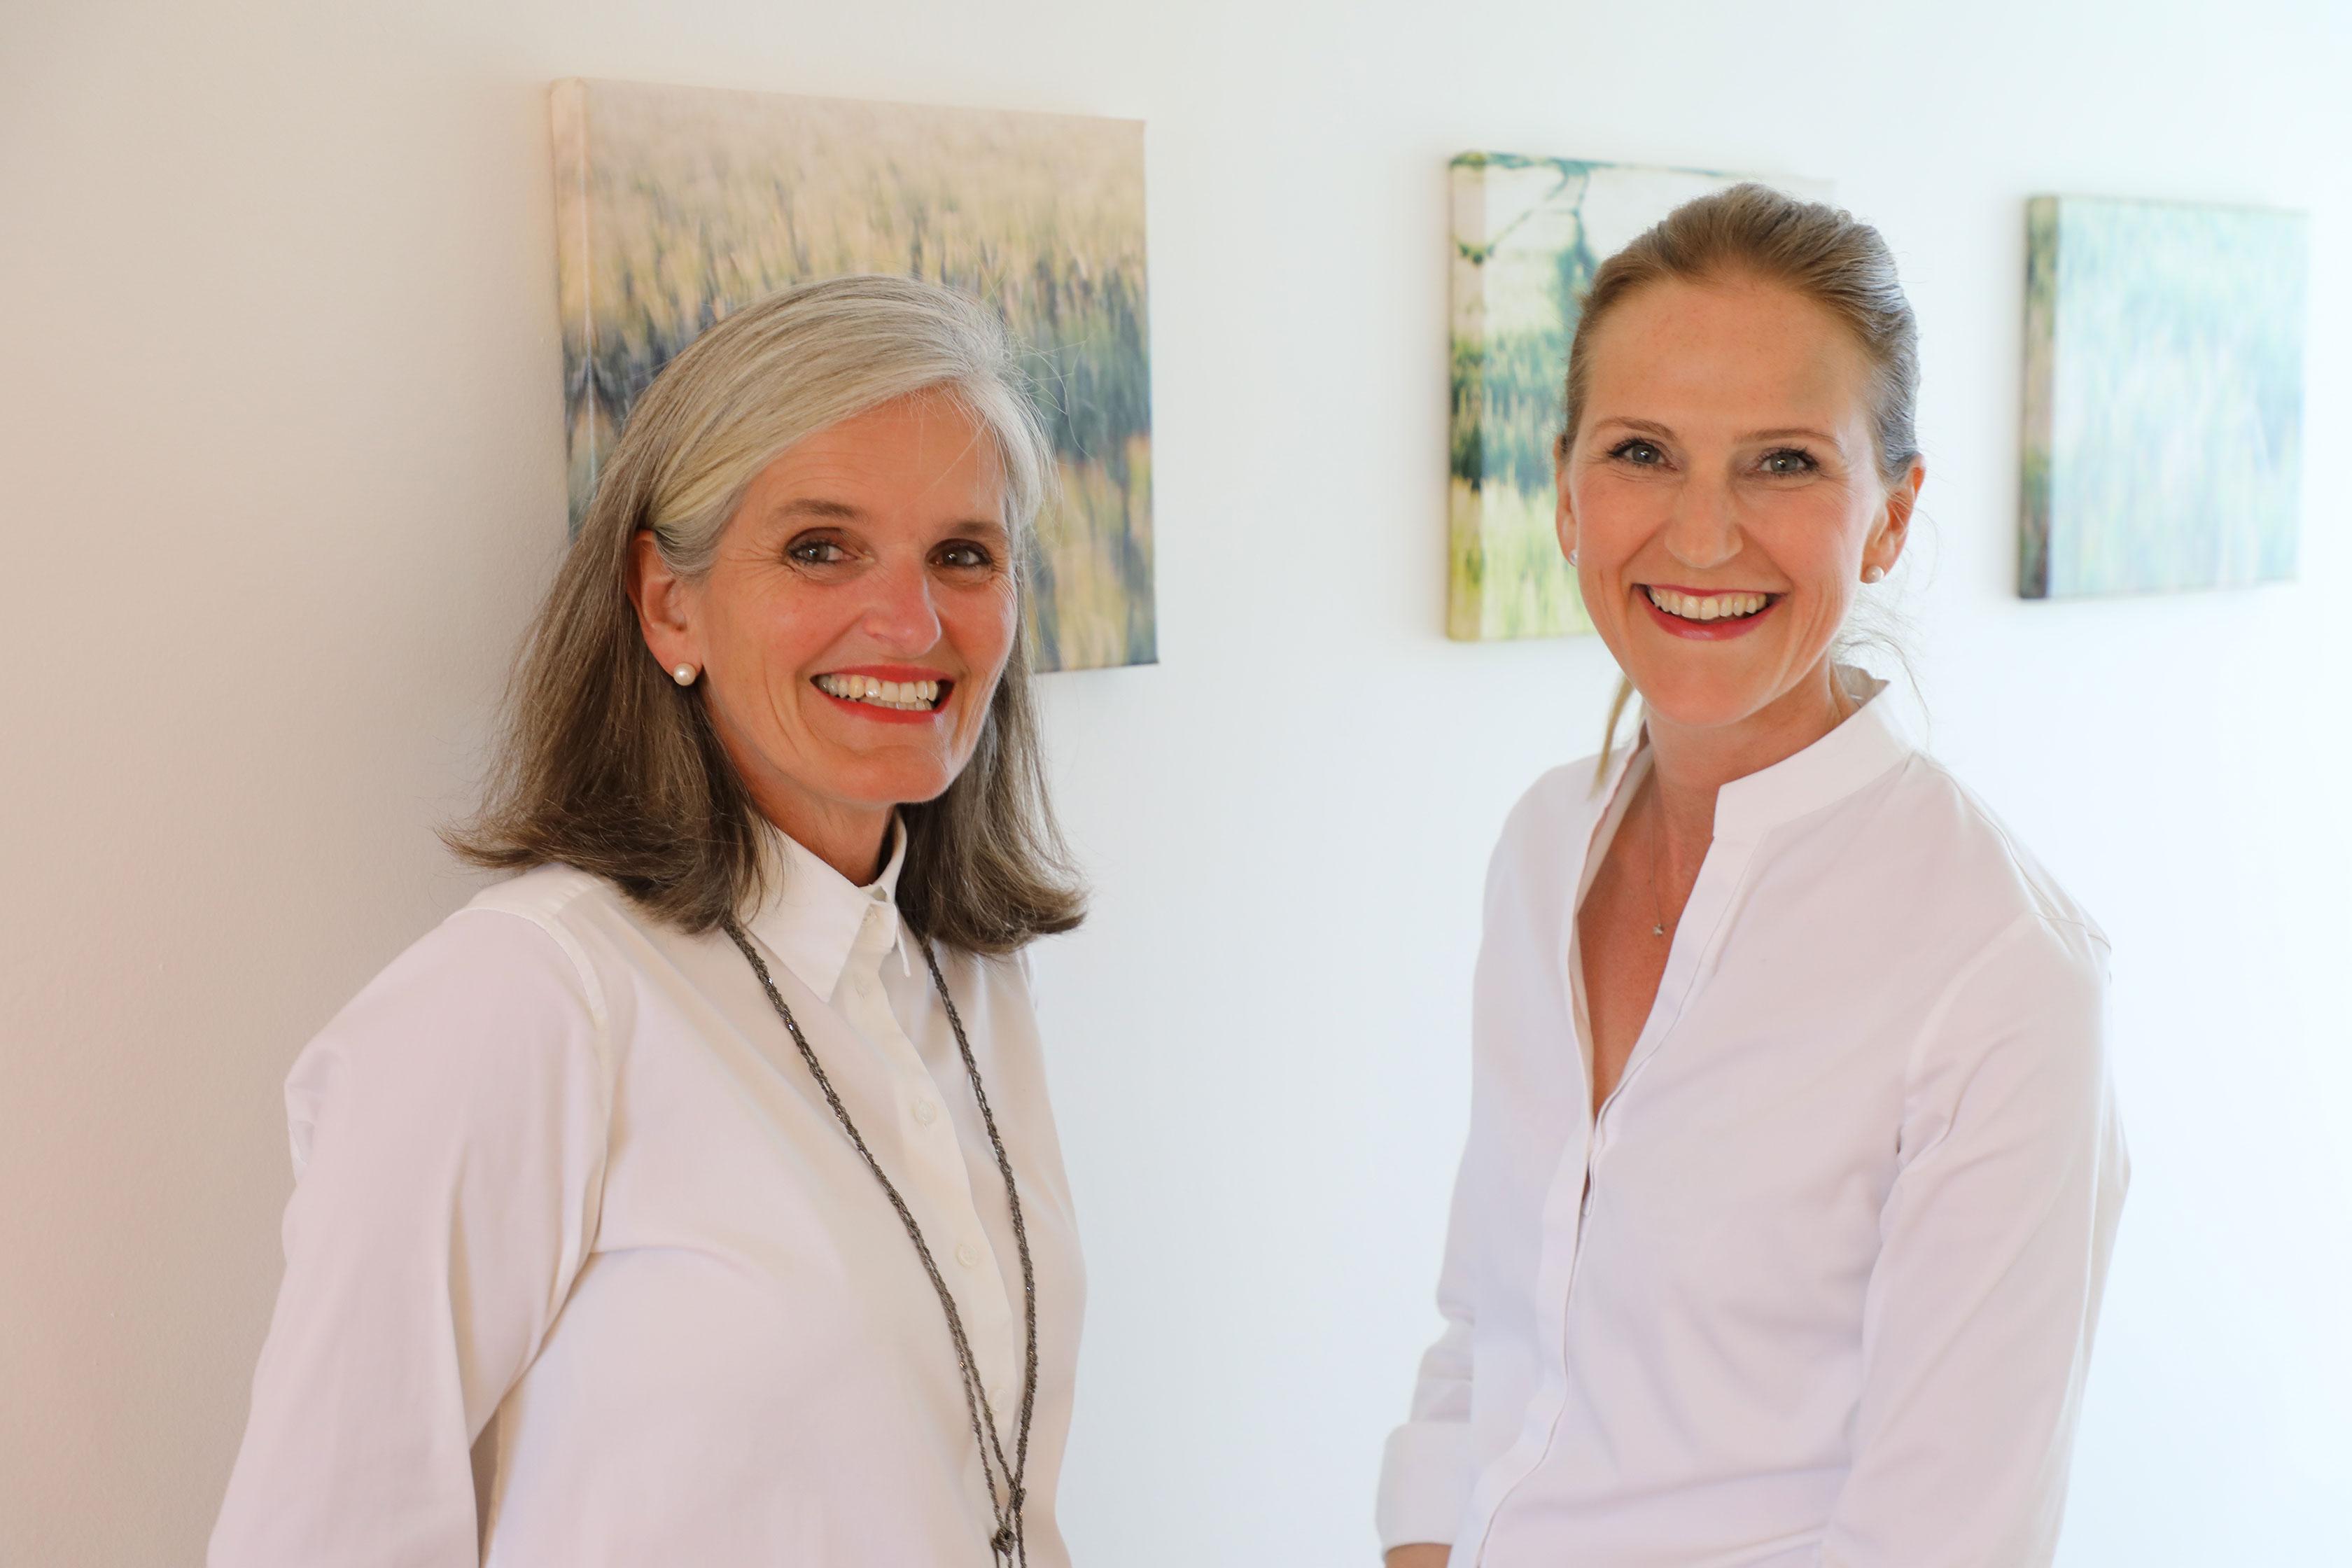 Dr. med. Ariane Netzer und Dr. med. Claudia Gehring